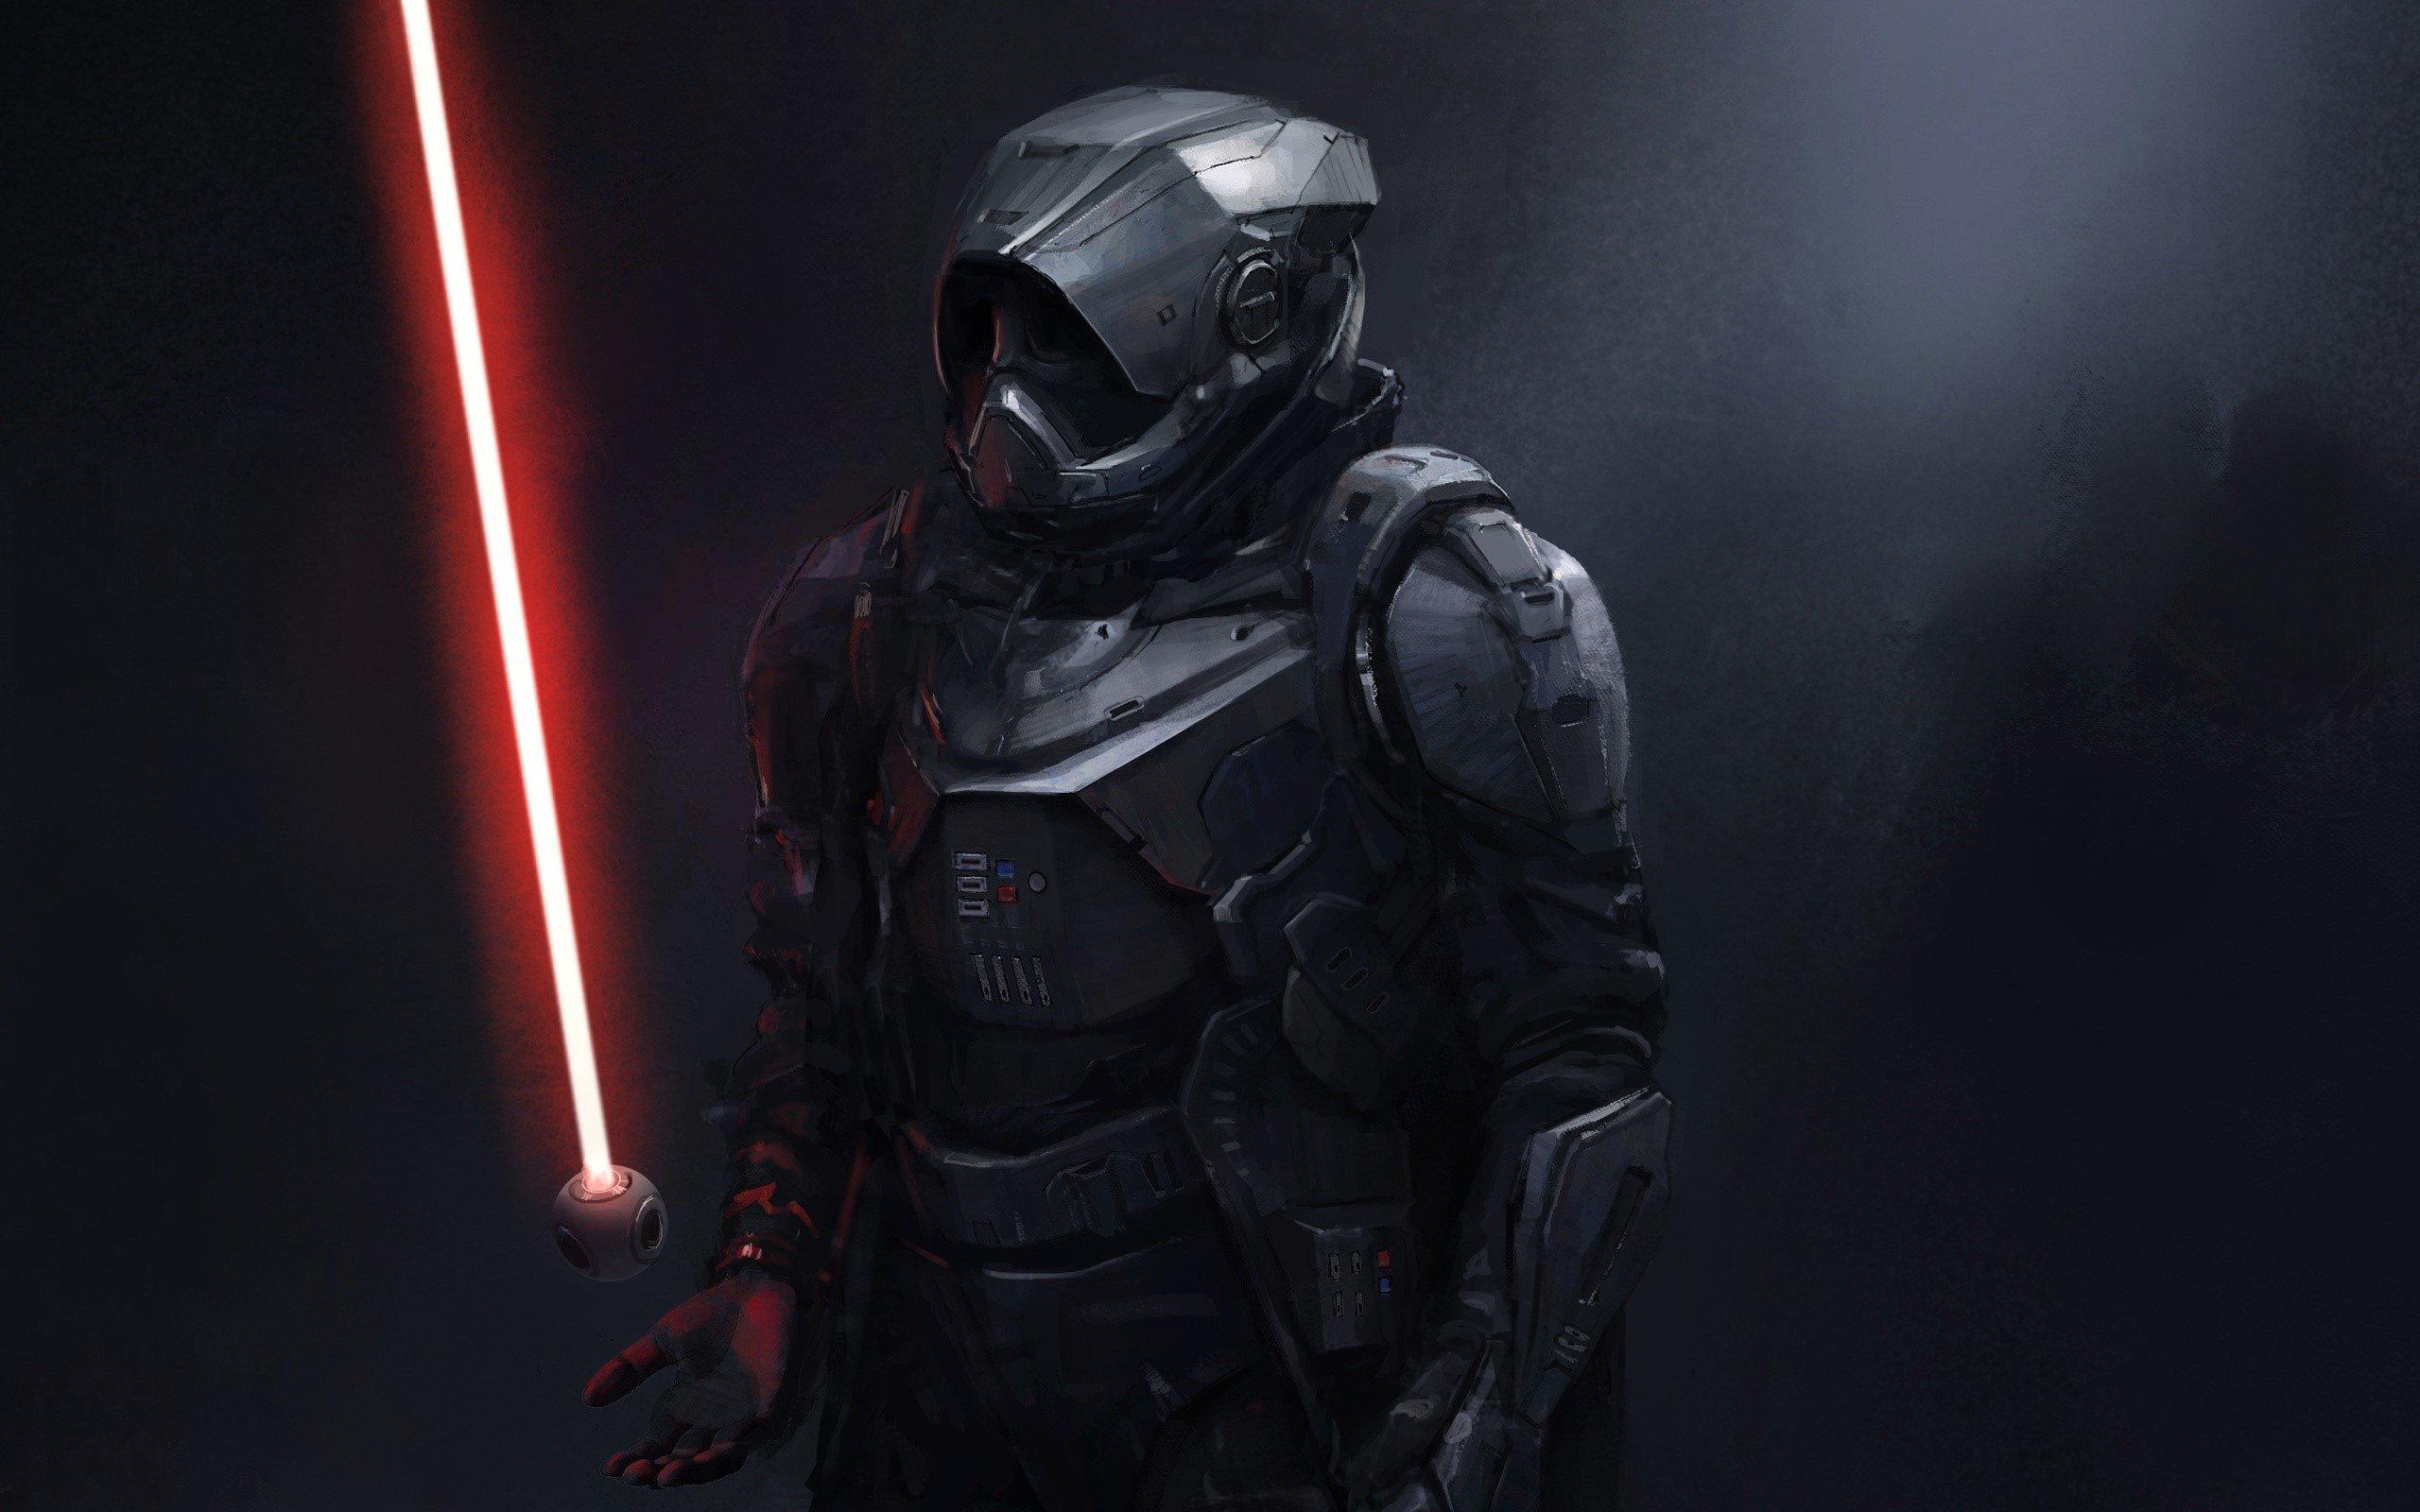 Fondos de pantalla Darth Vader Anakin Skywalker